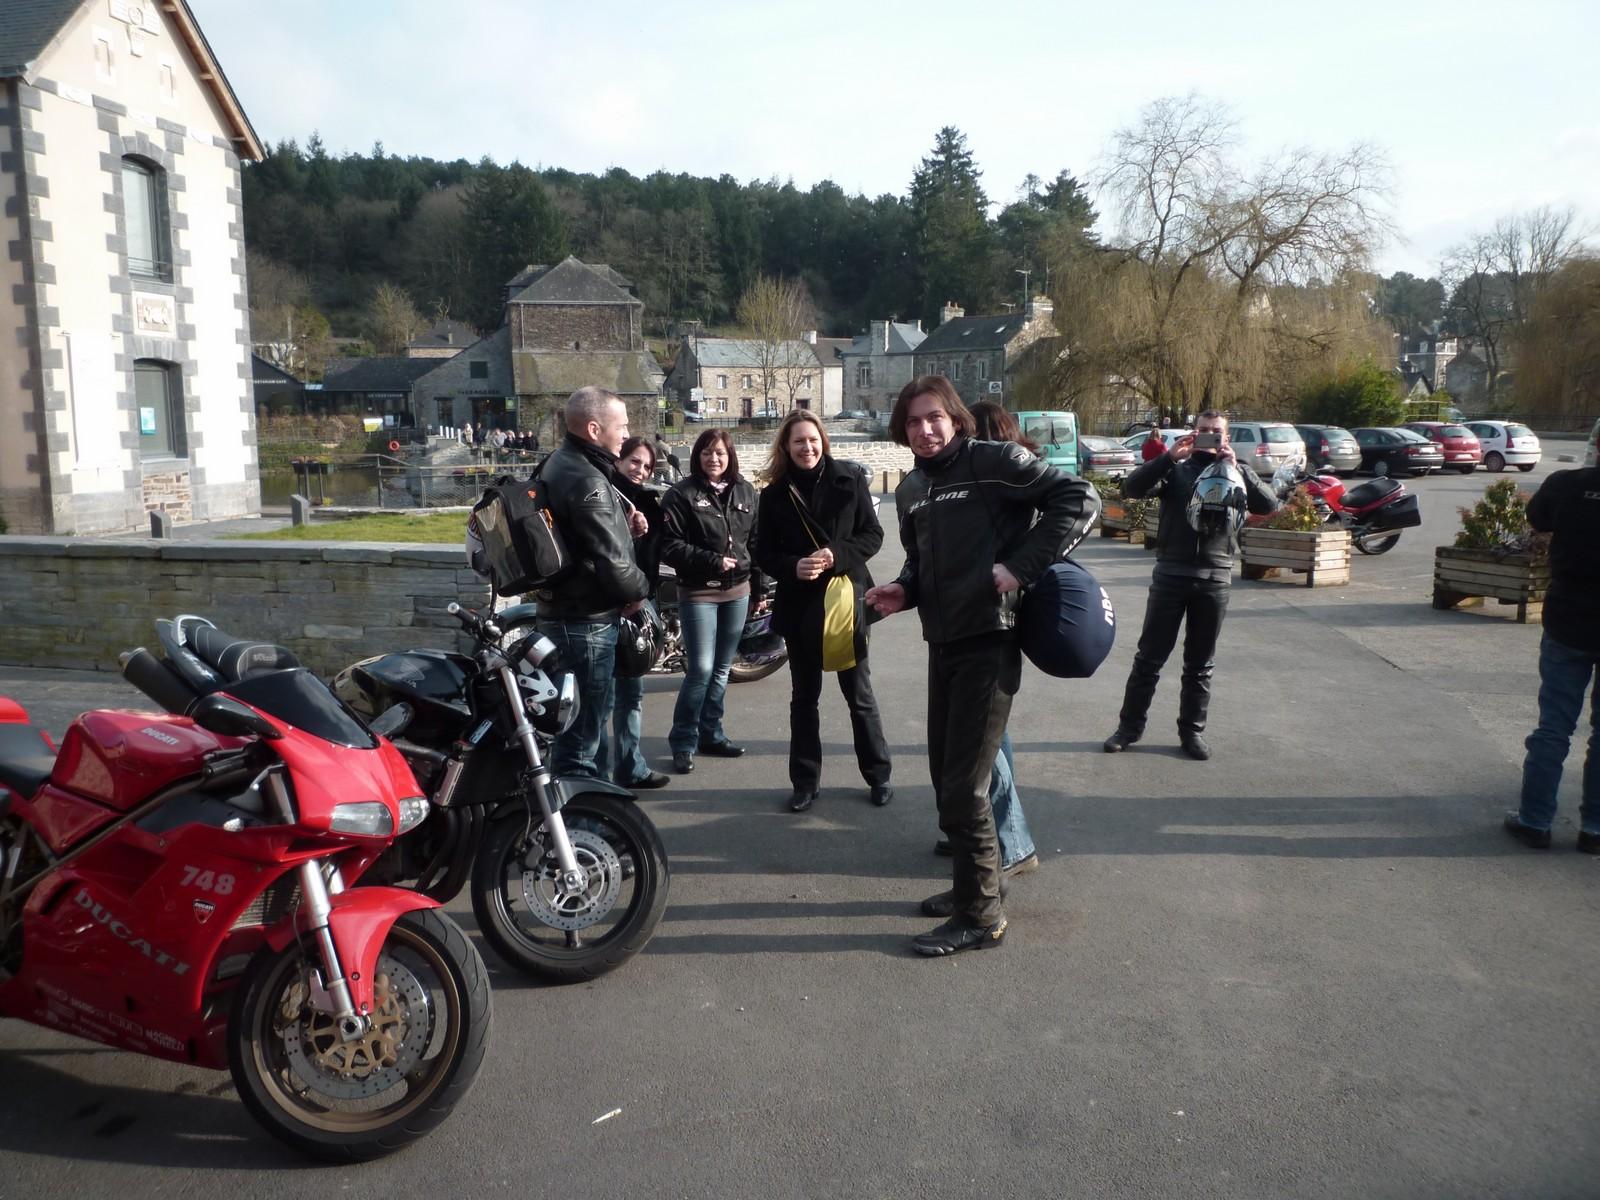 moto 03 12 AGmoto  BMX 04 12 002 (Copier)